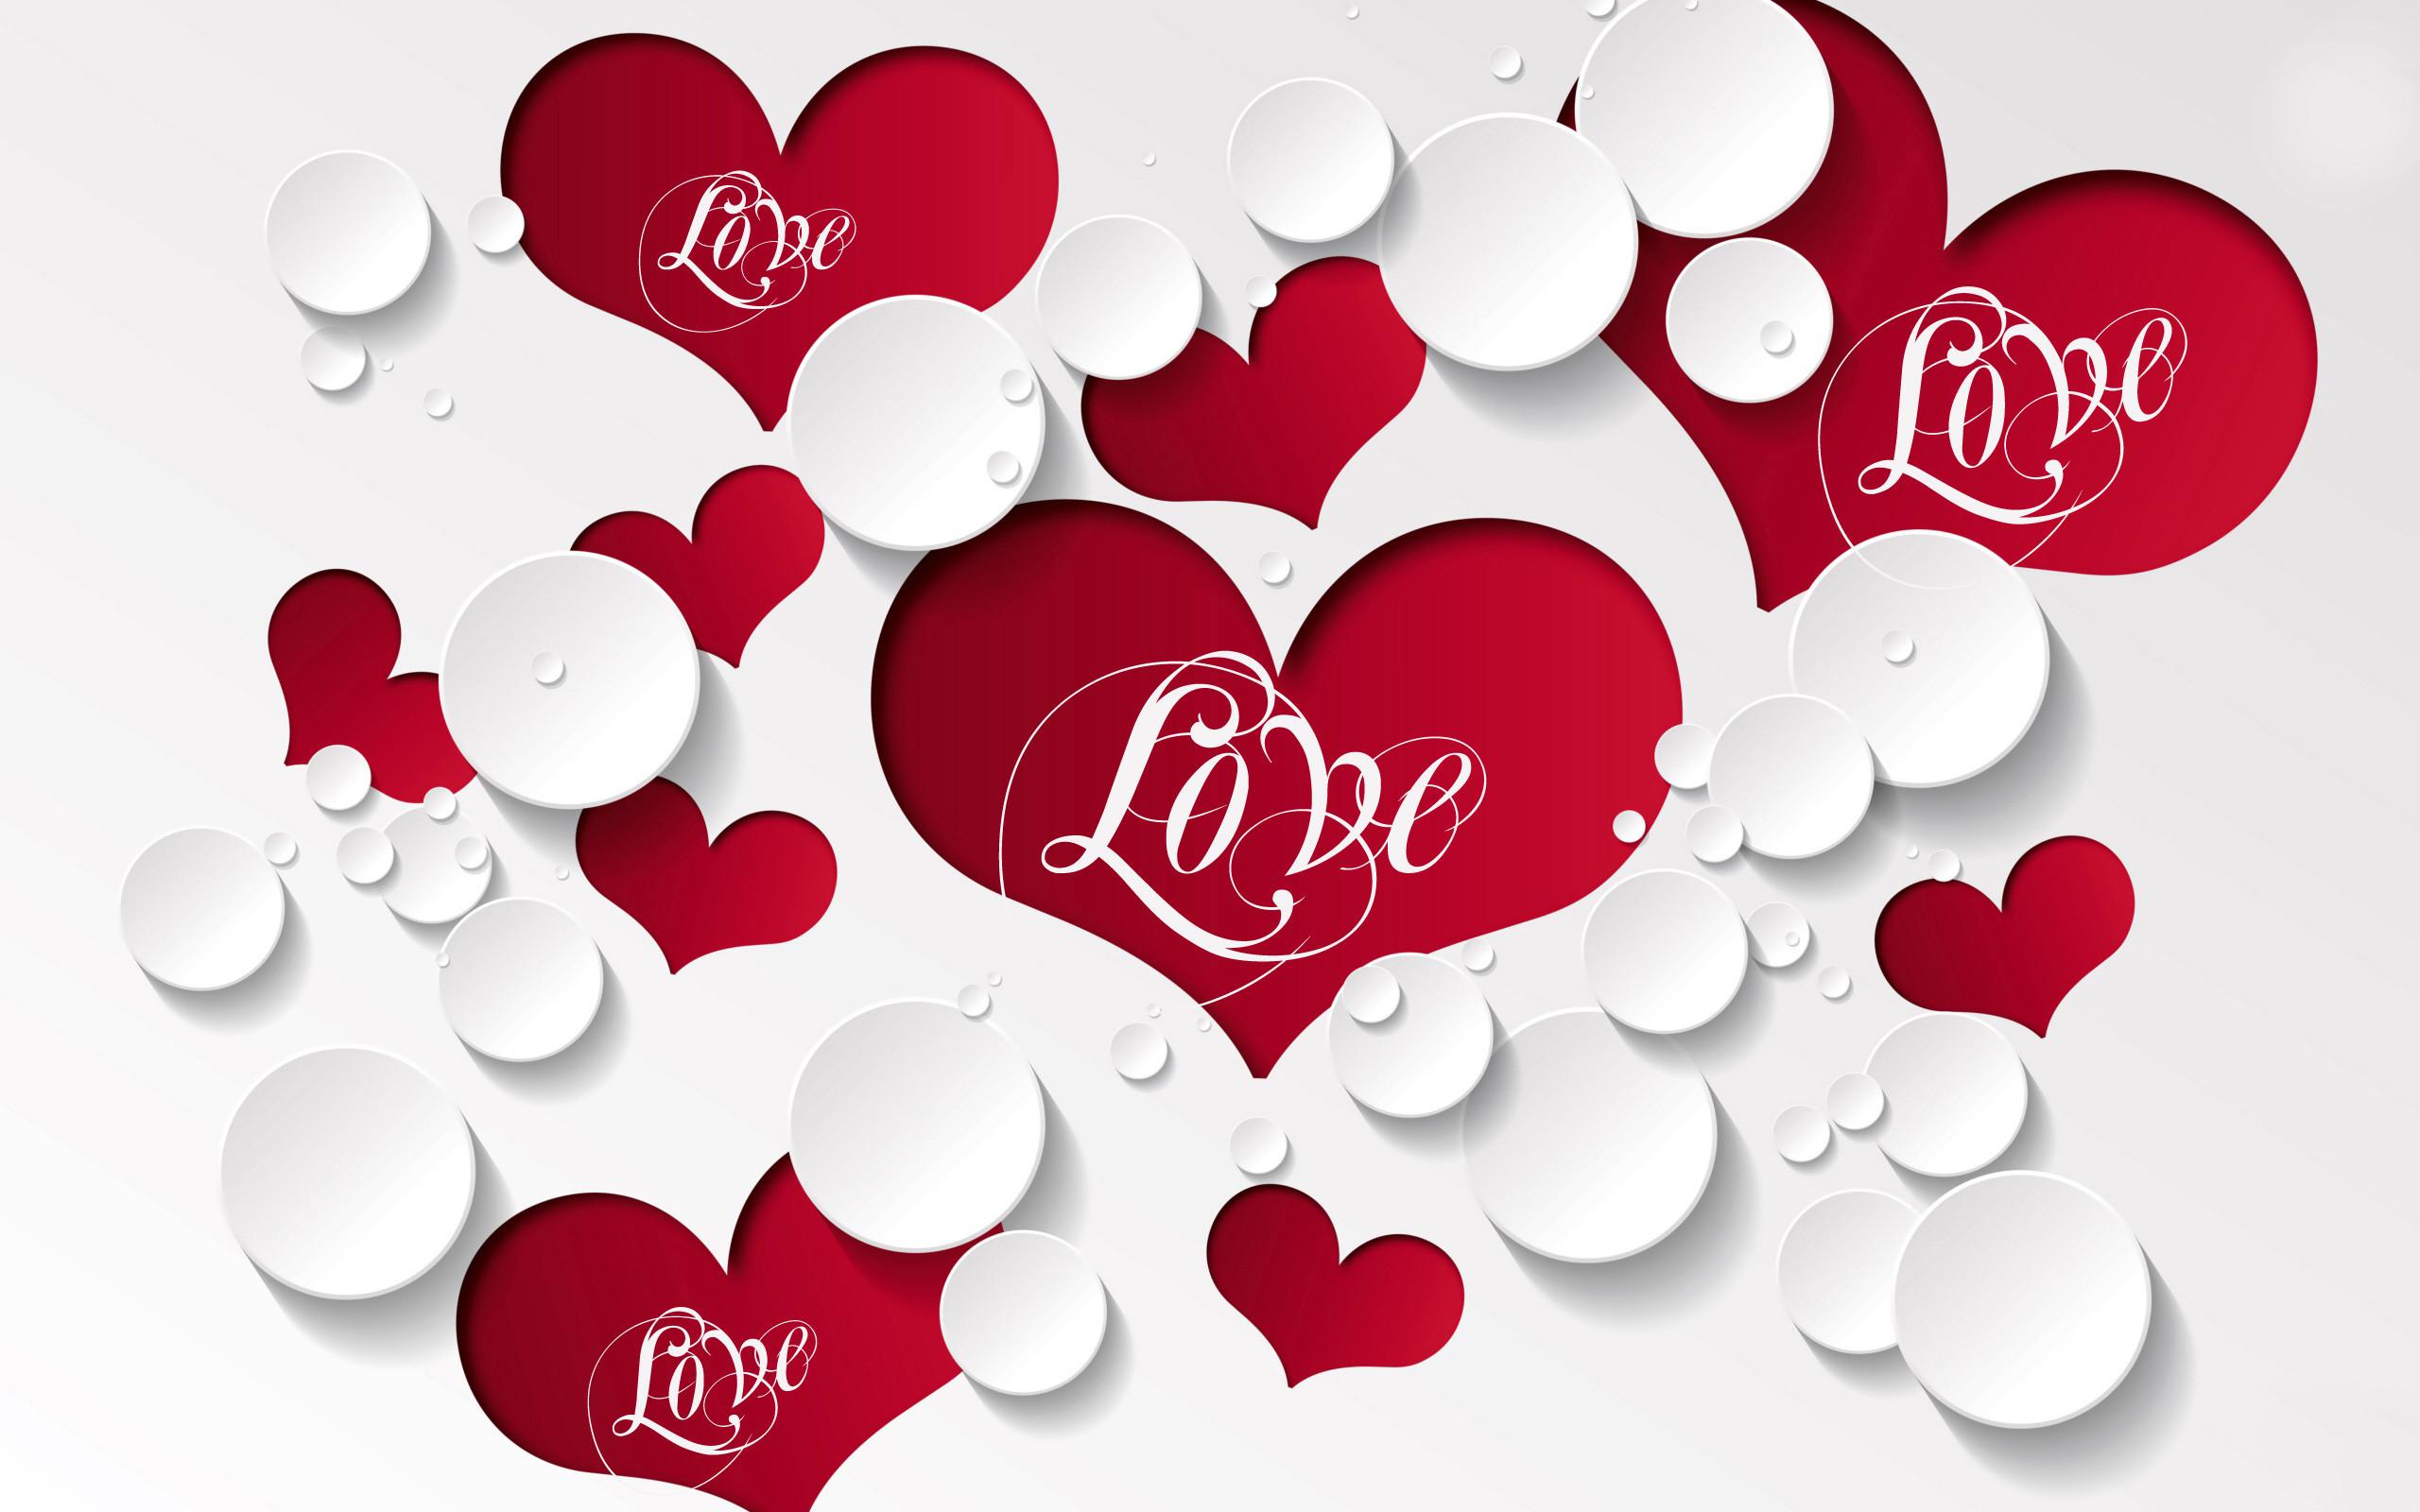 love heart hd image HD wallpaper – Love Hearts